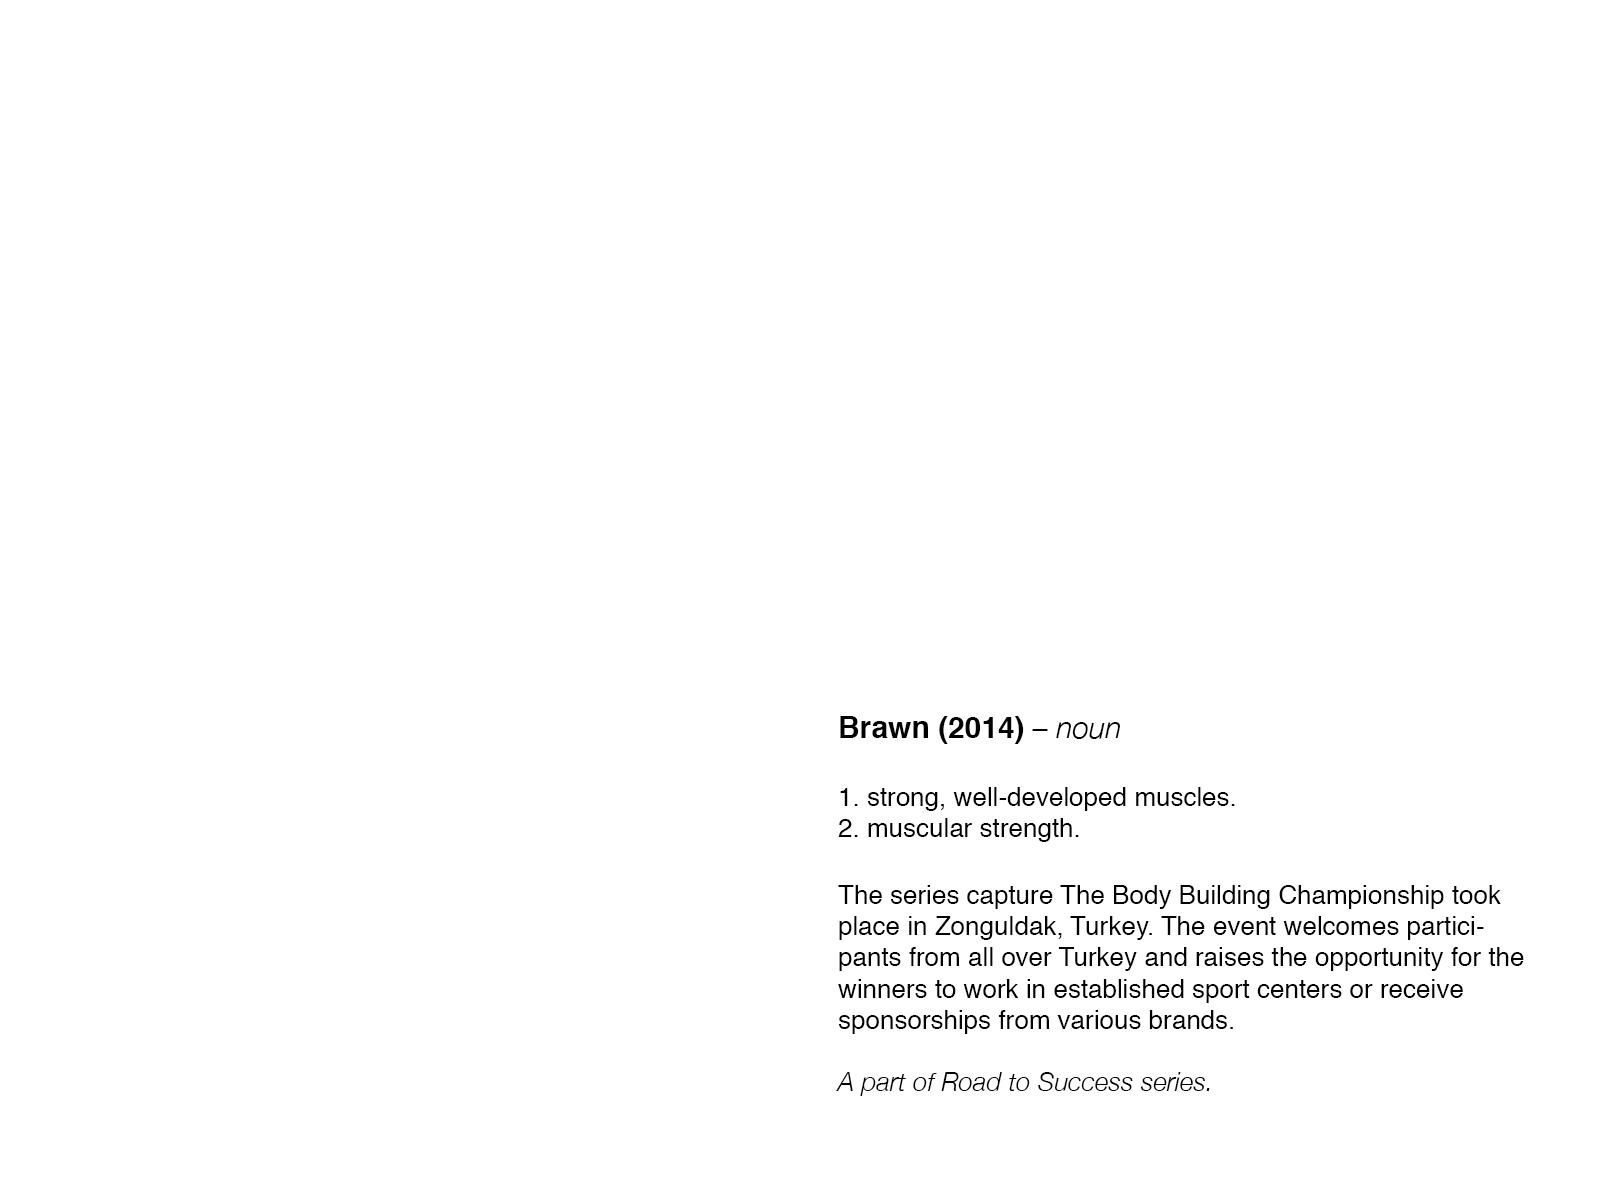 text_brawn.jpg